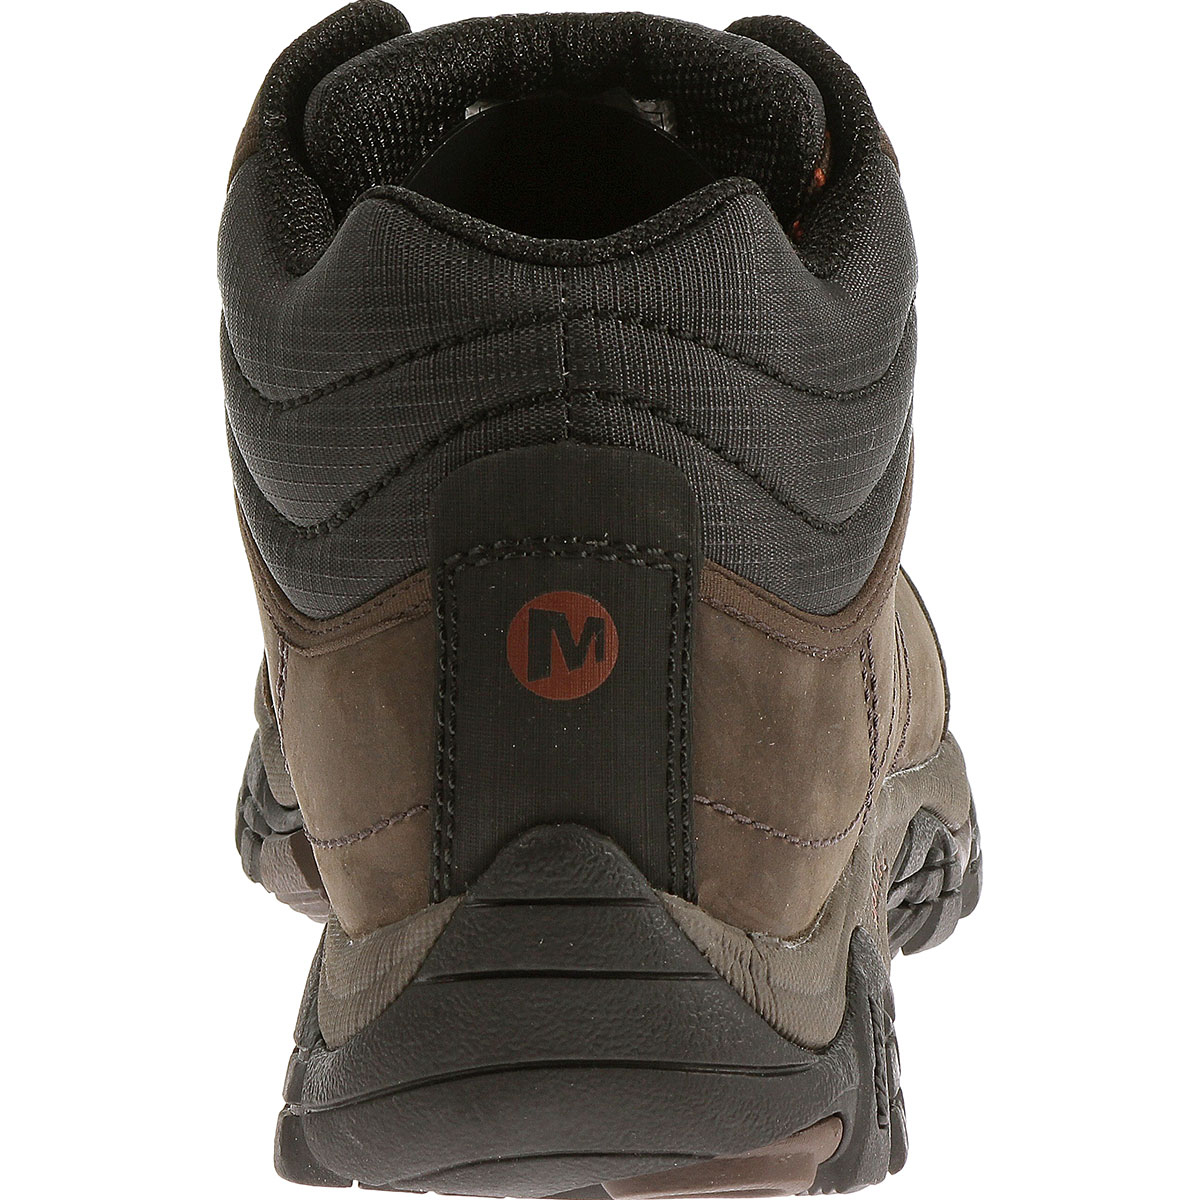 MERRELL Men's Moab Rover Mid WP Boots